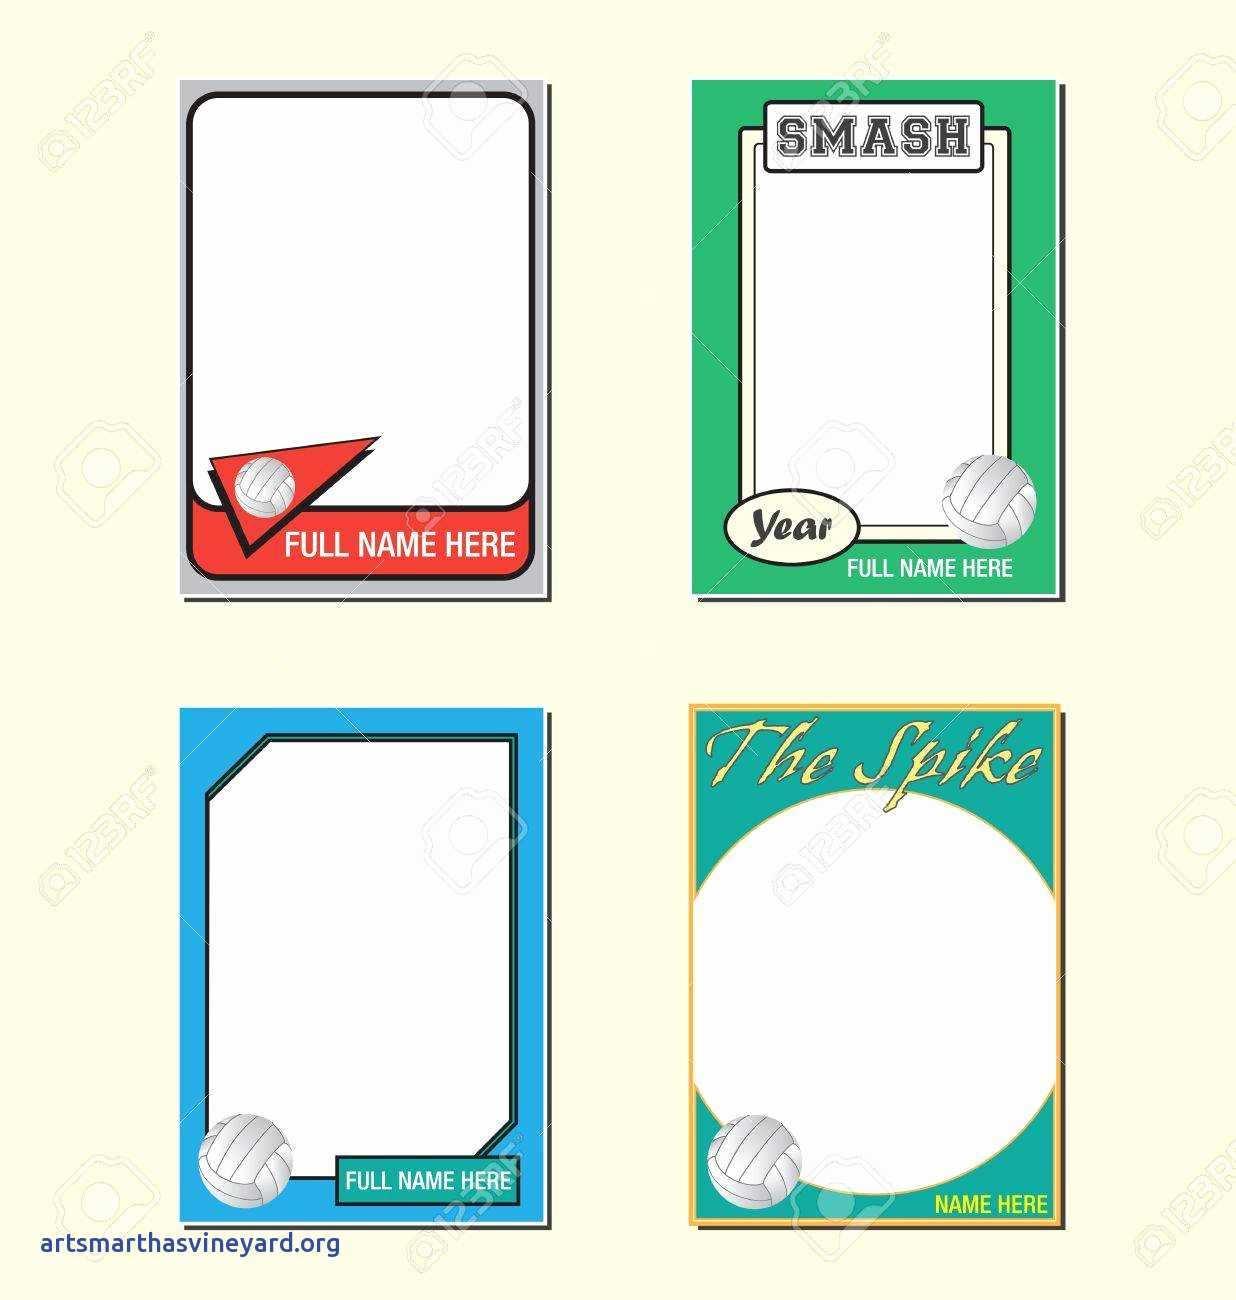 85 Standard Baseball Name Card Template in Photoshop for Baseball Name Card Template